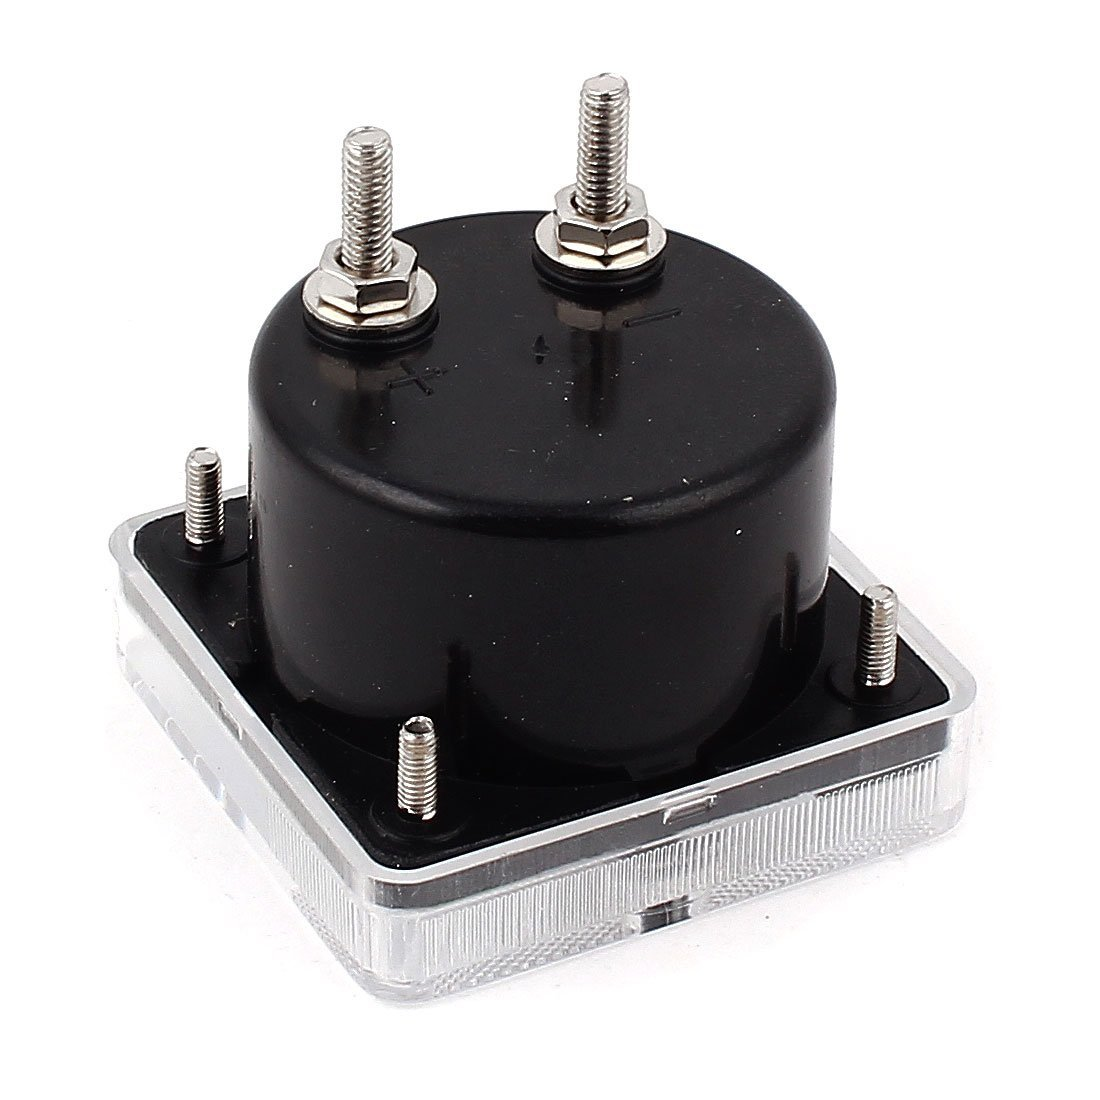 eDealMax AC 0-300V Panel Medidor analógico del voltaje de voltio Calibrador voltímetro analógico - - Amazon.com